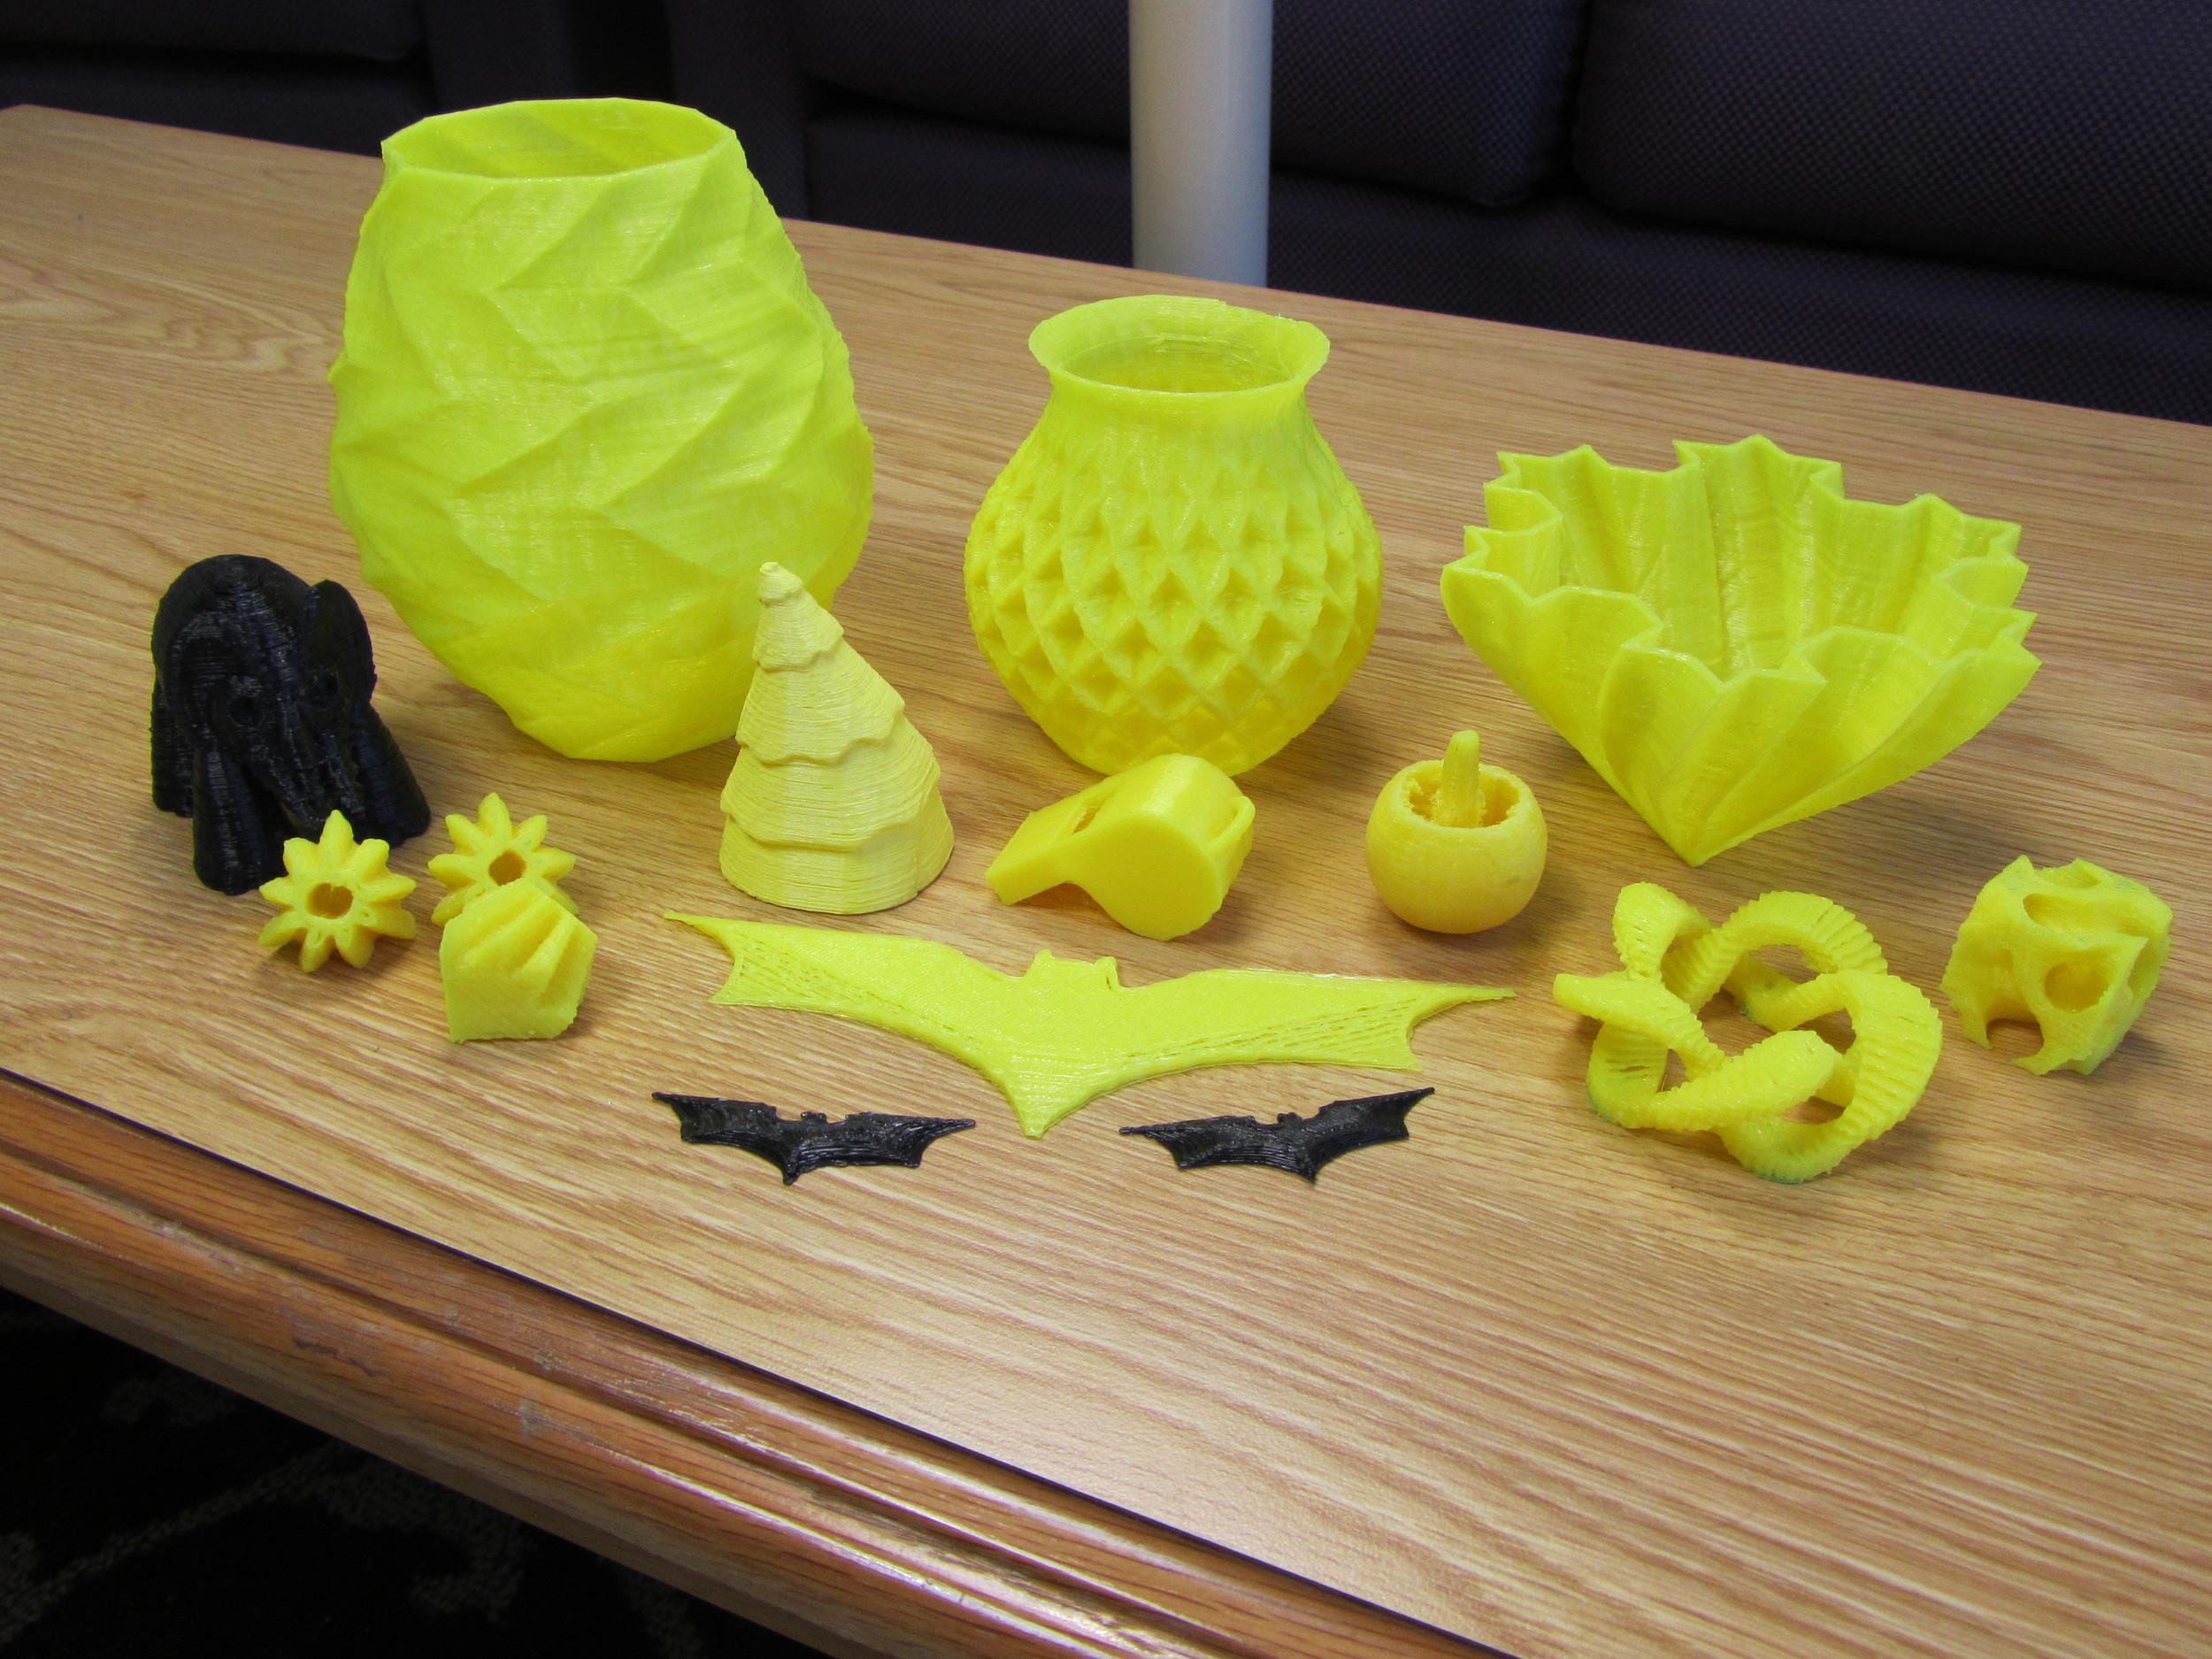 3D printed stuff!